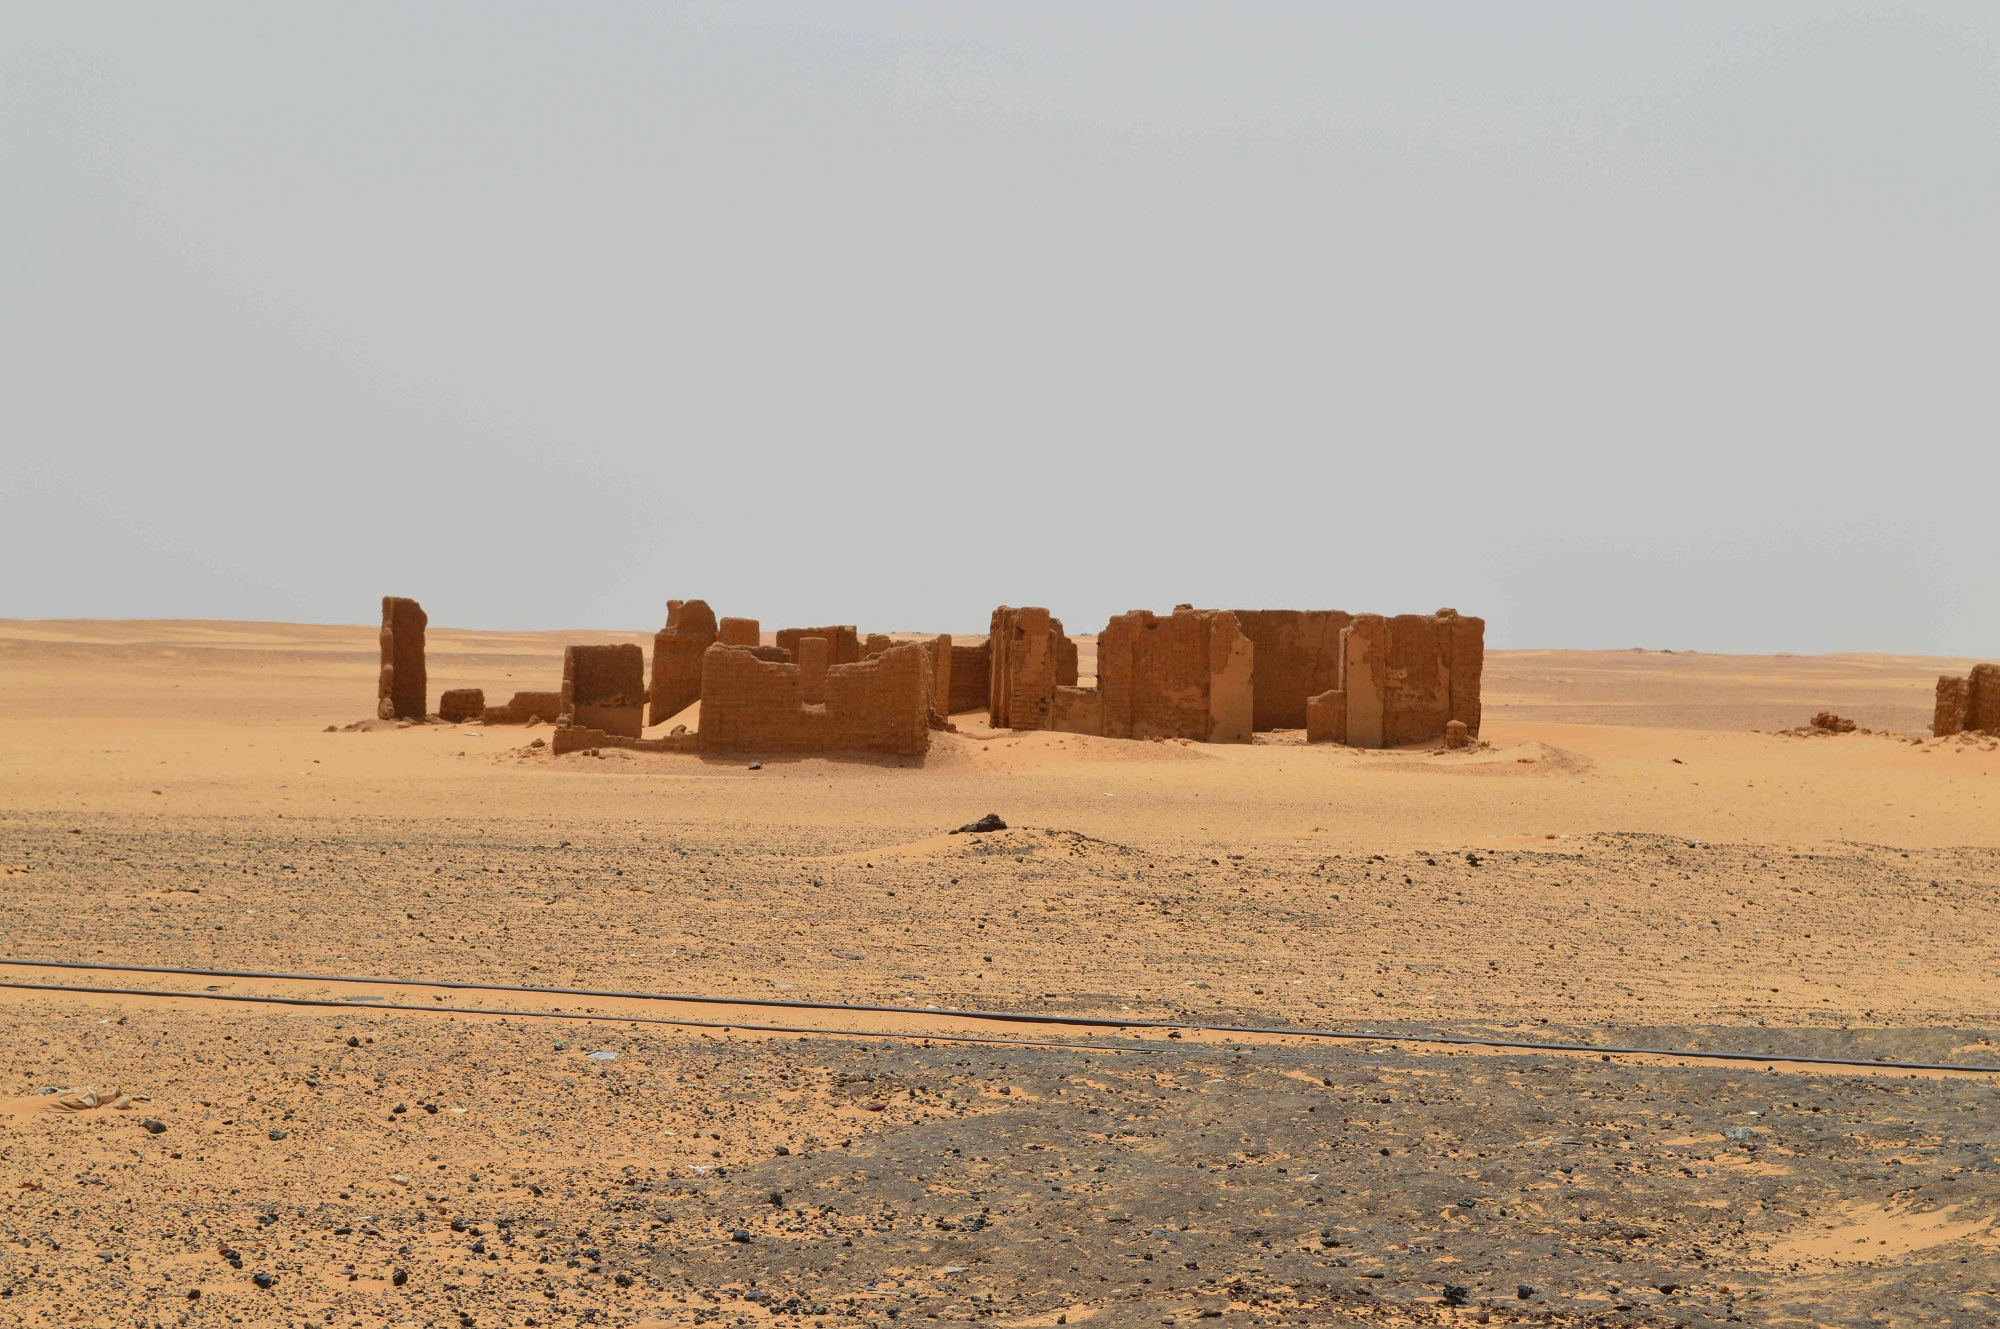 2014-CMCPHERSON-SUDAN-14